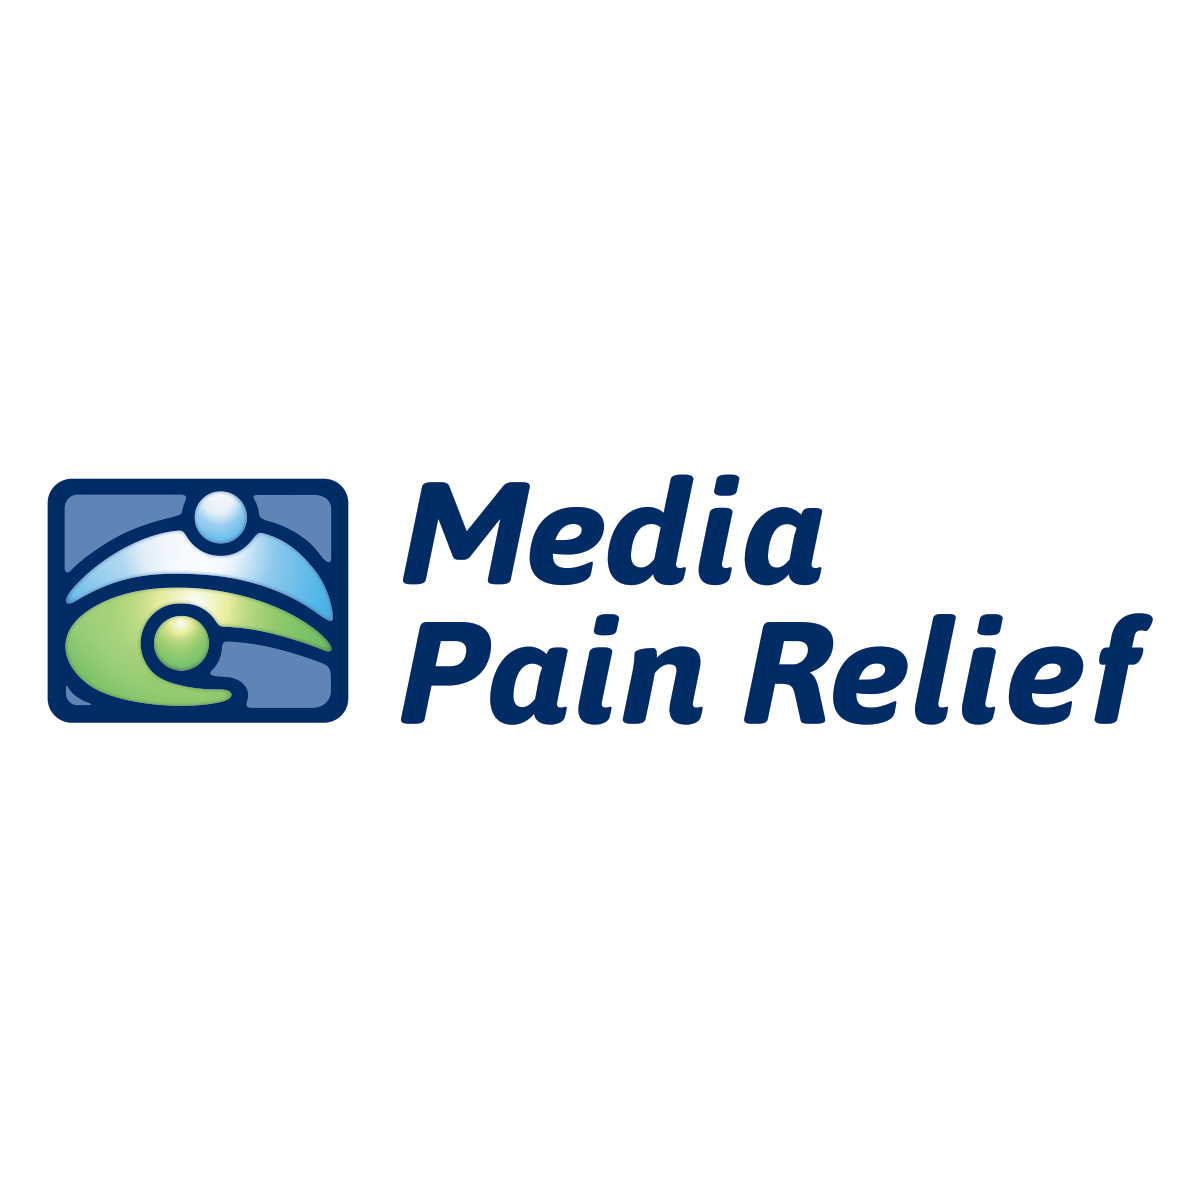 Media Pain Relief